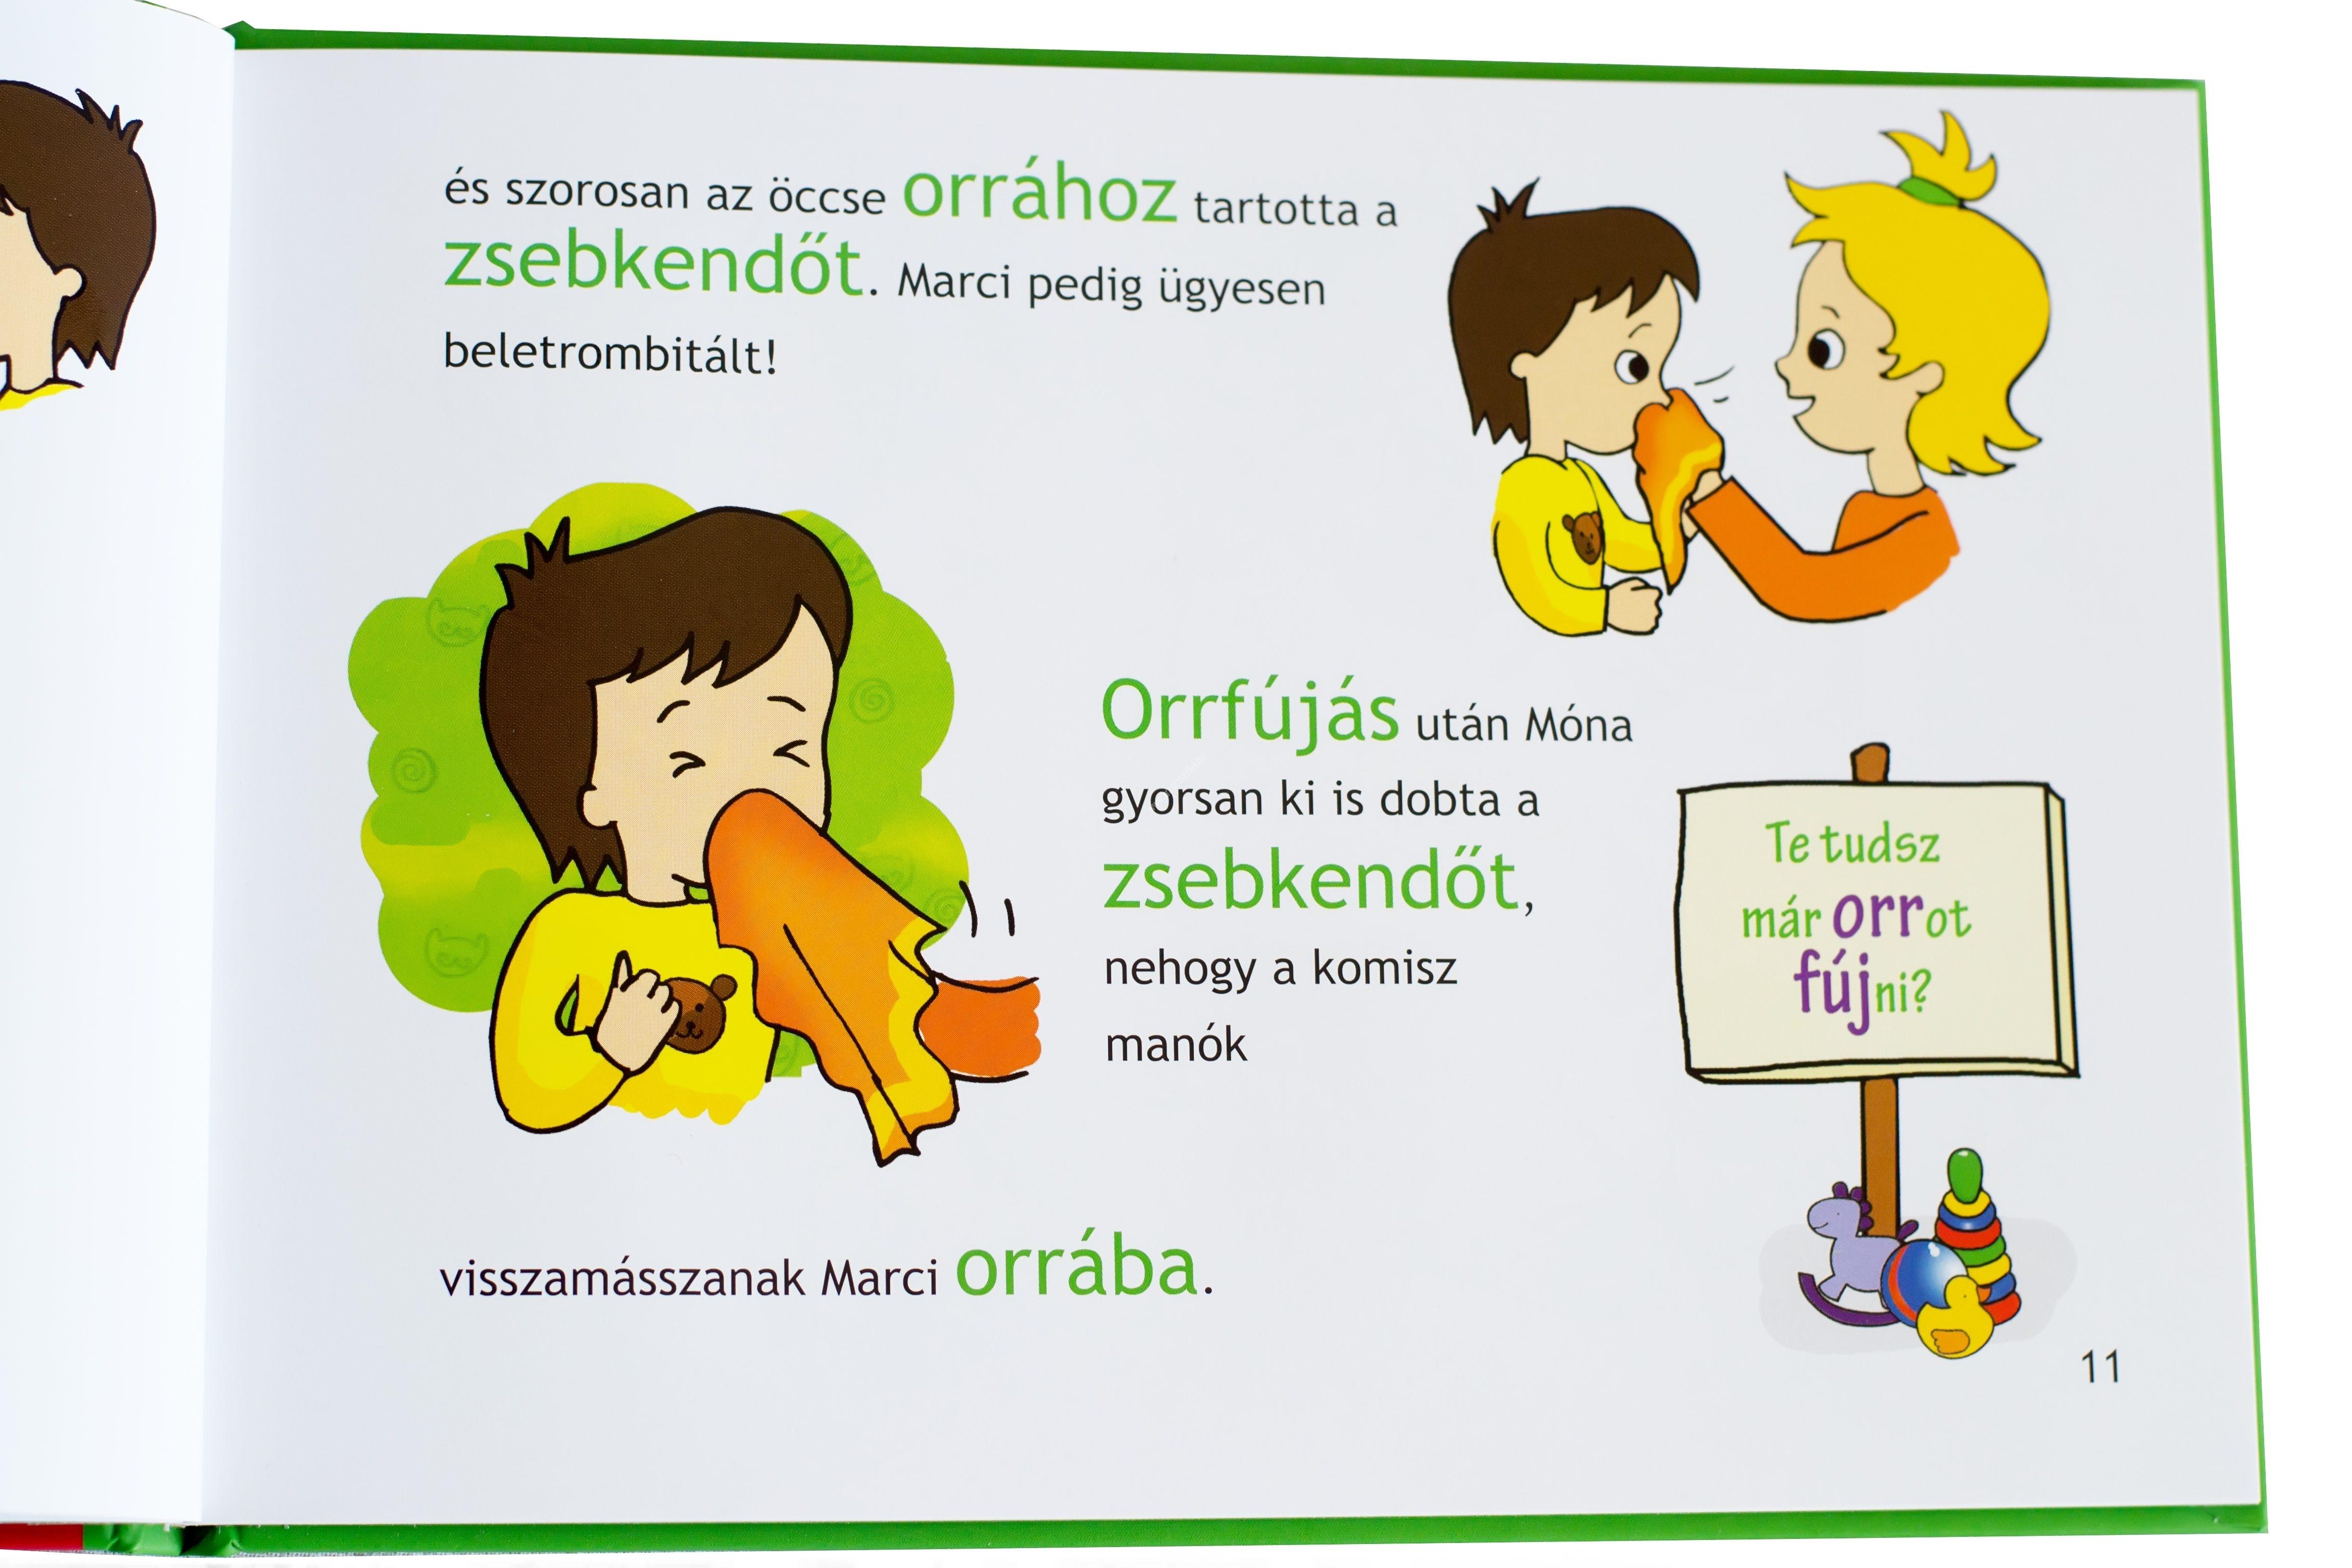 szokimondoka-orr-es-ful-testreszek-mese